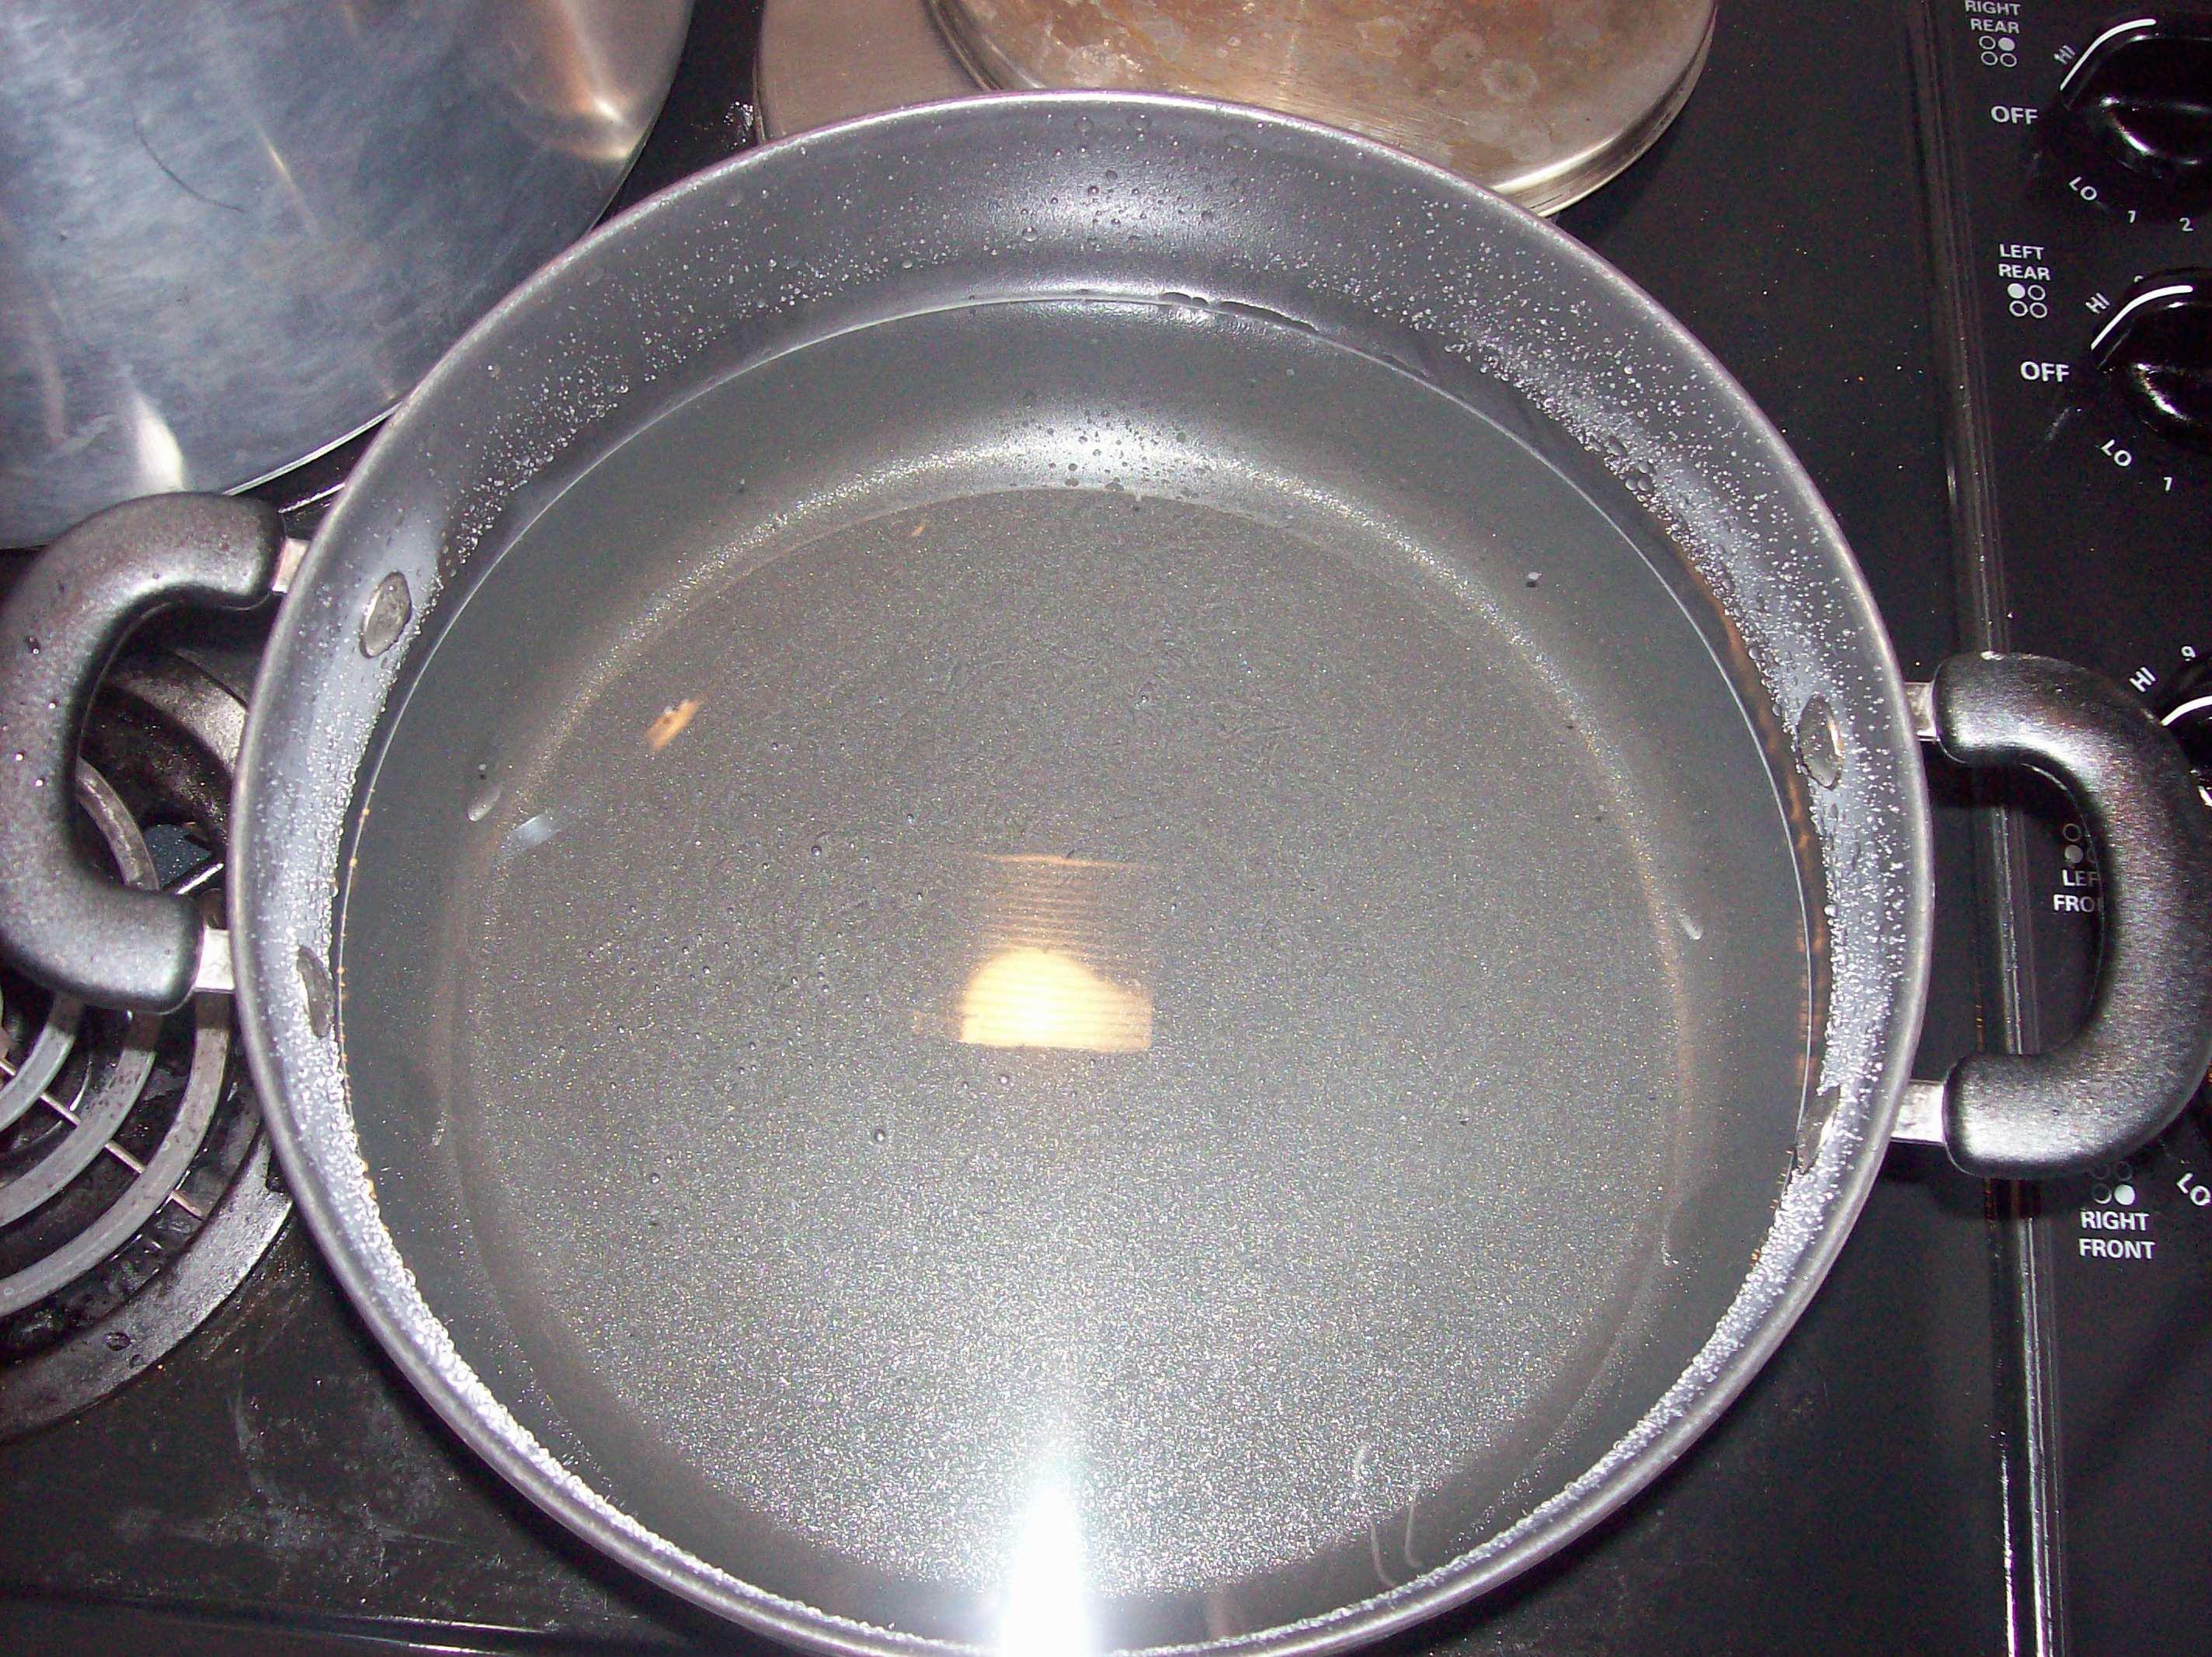 Noobies Sawdust/Wood chip tek - Gourmet and Medicinal